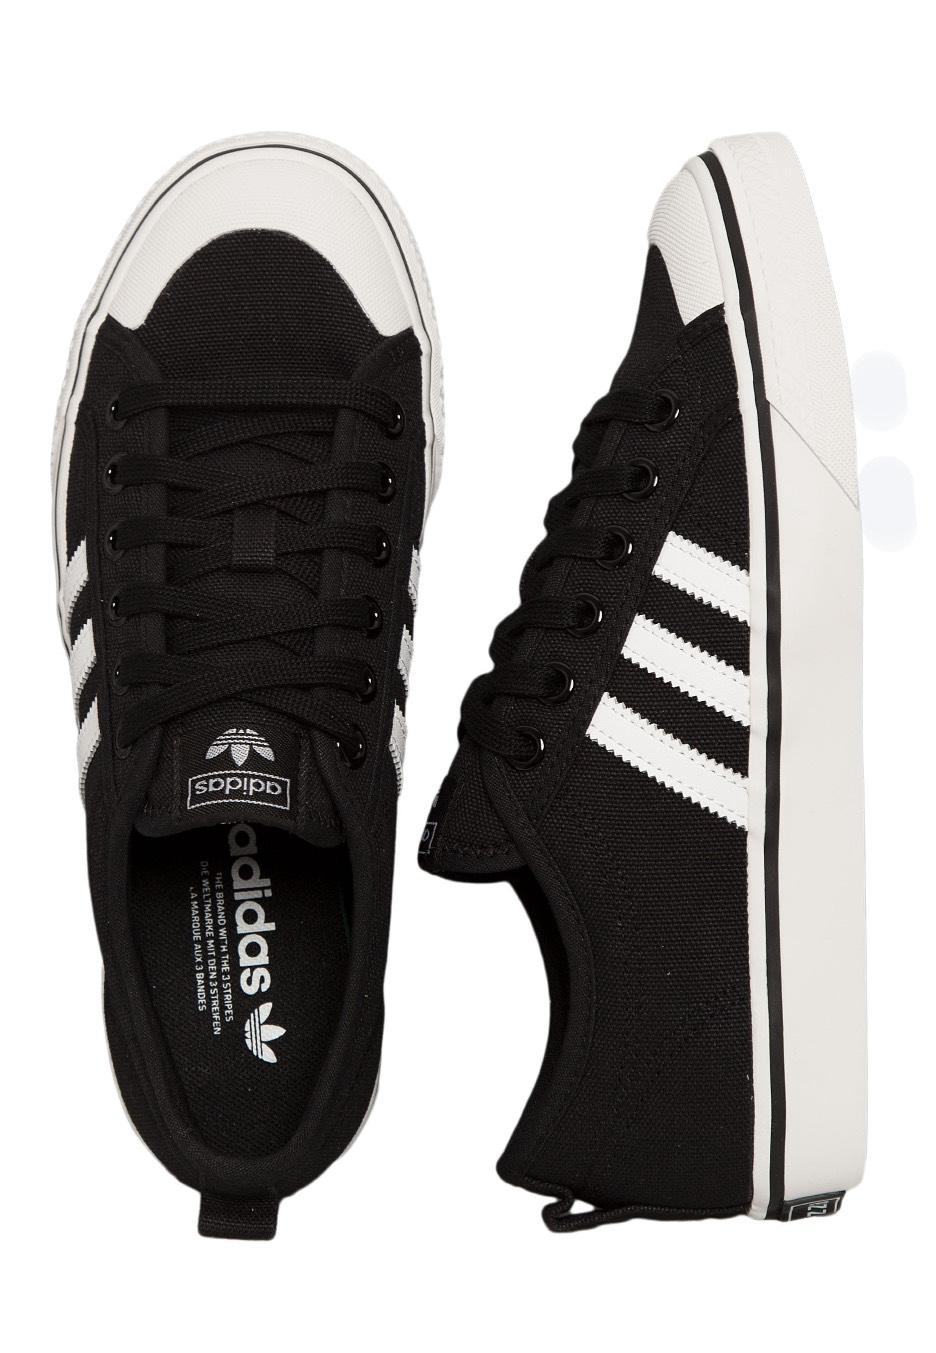 Adidas Core Nizza Blackftwr White Girl Schuhe Whitecrystal qUMVpSz